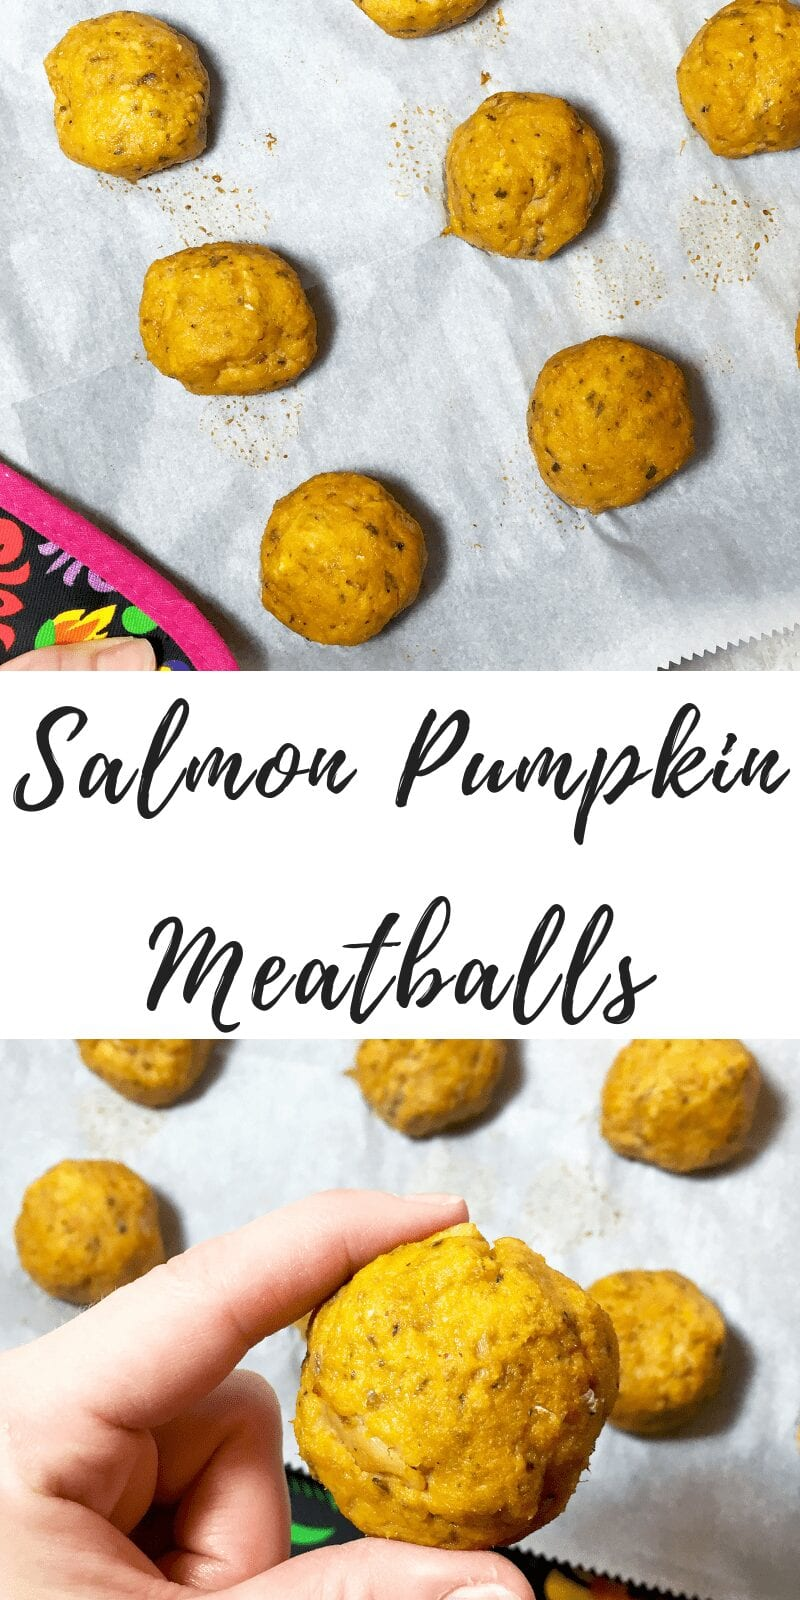 Salmon pumpkin meatballs